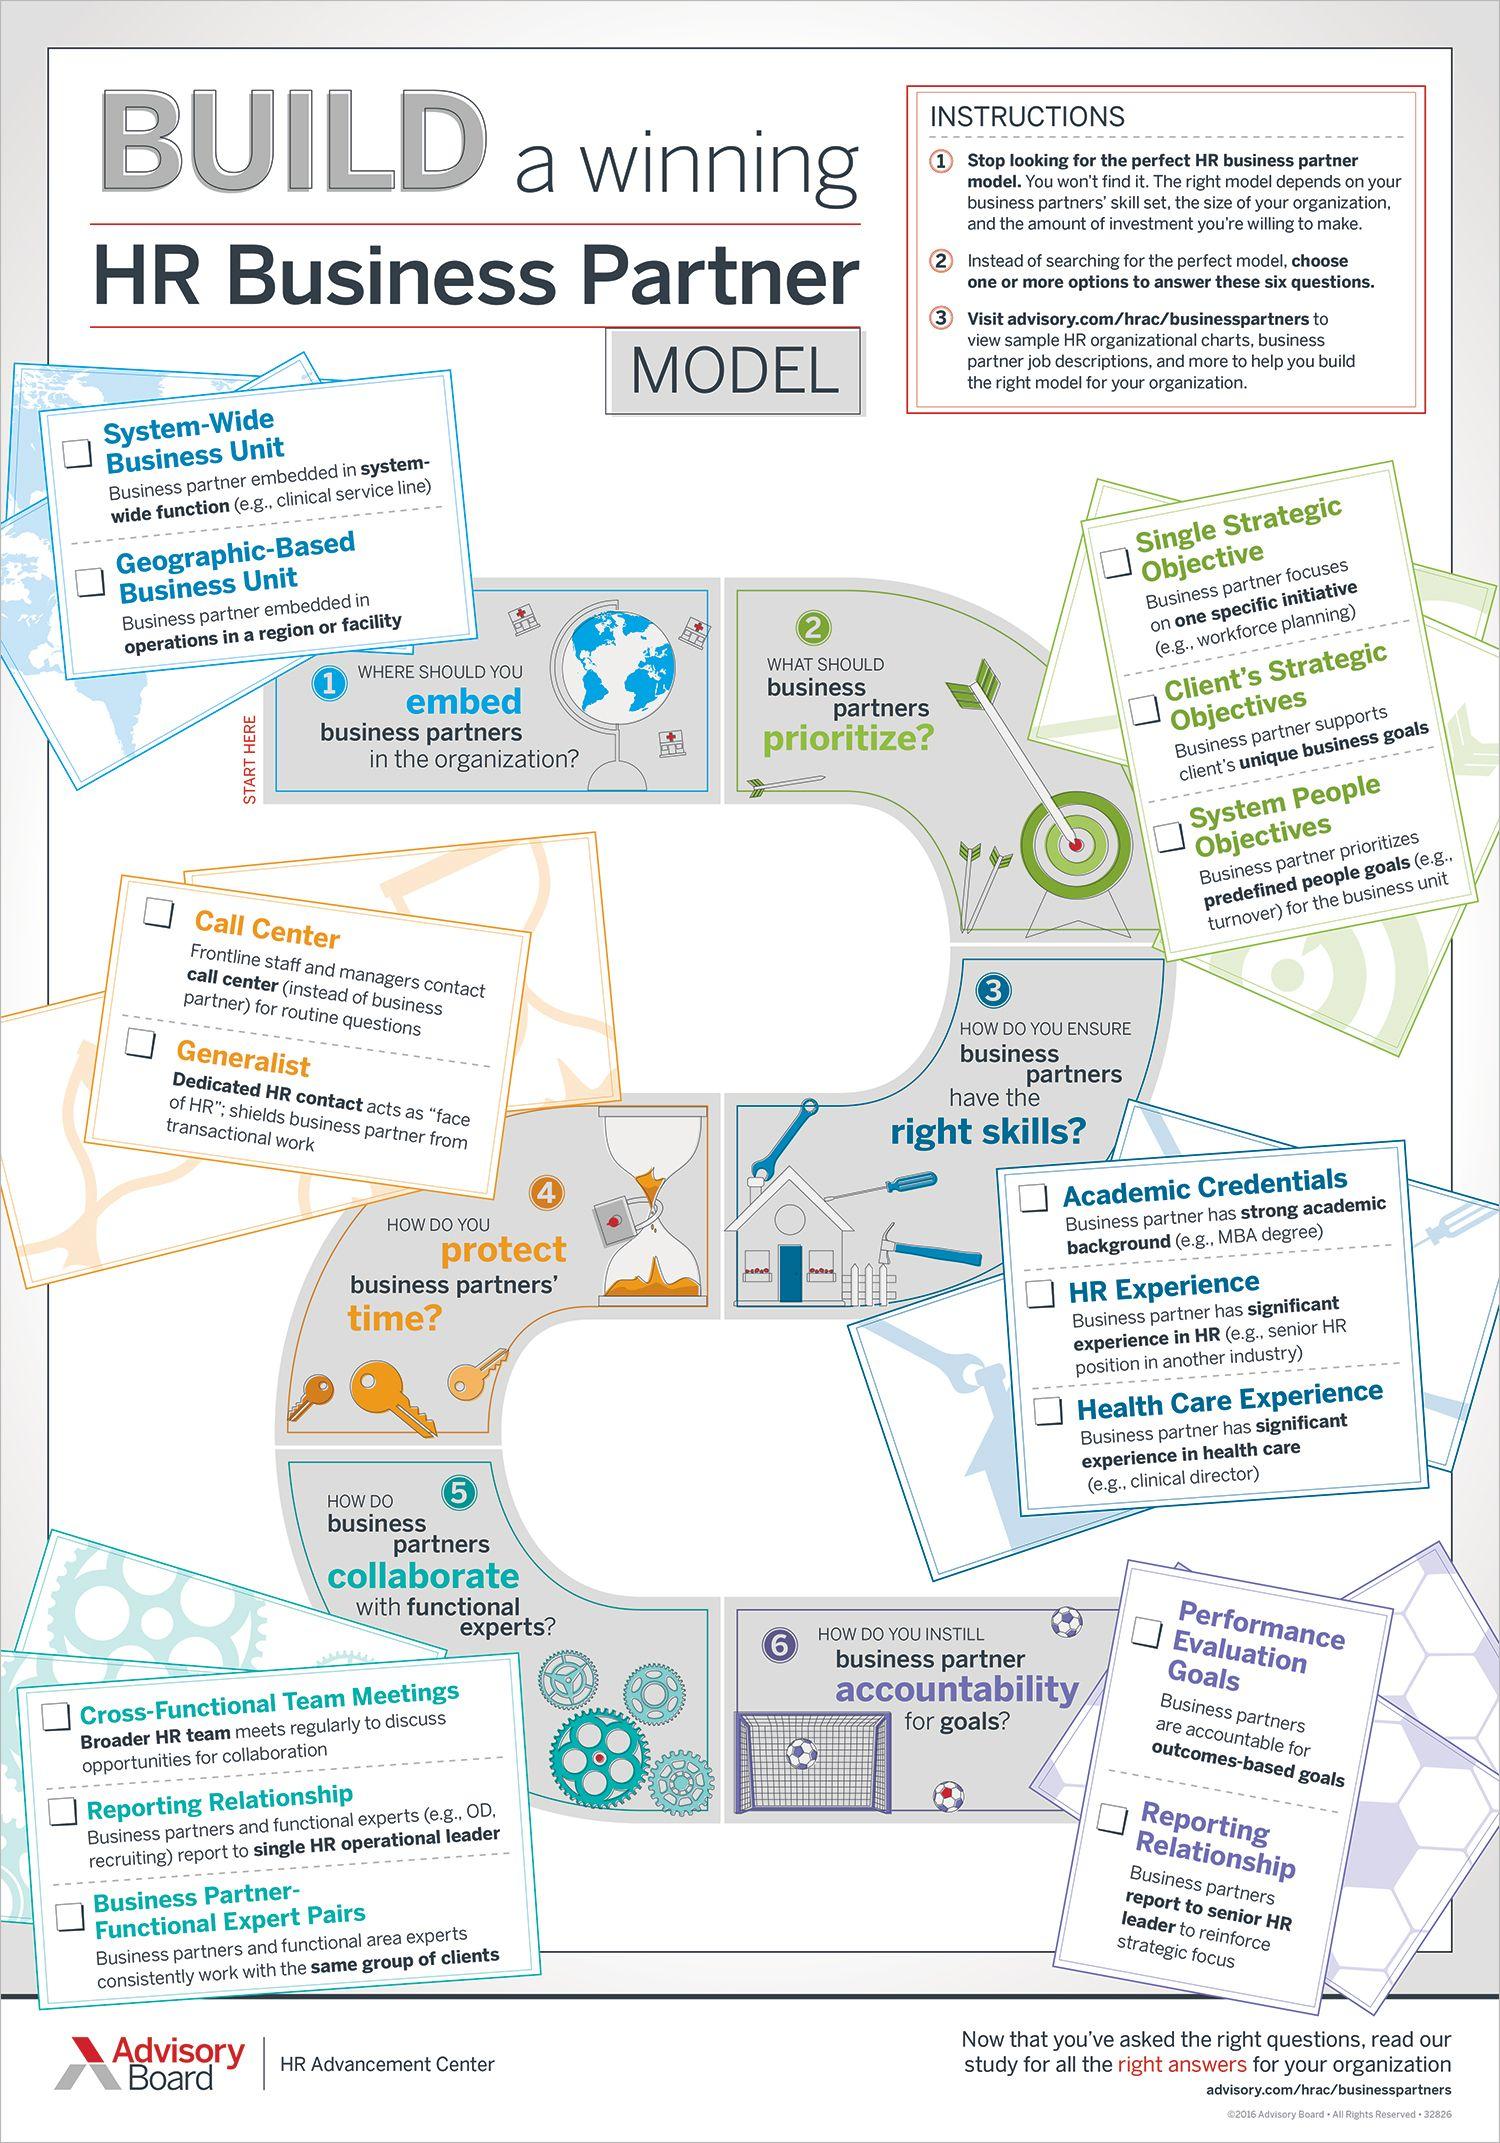 Build A Winning Hr Busines Partner Model Theorie Human Resource Infographic Employee Relation Dissertation Topics